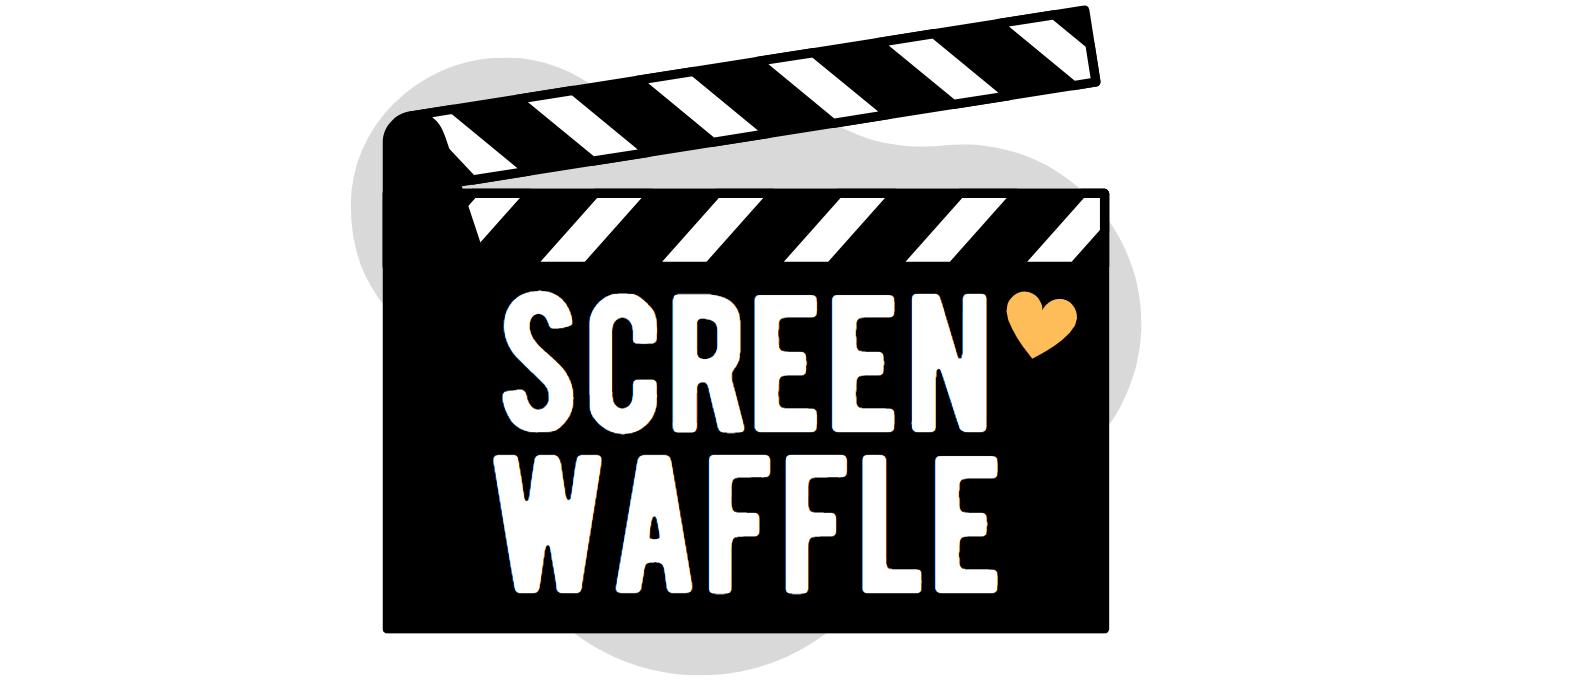 Screen Waffle